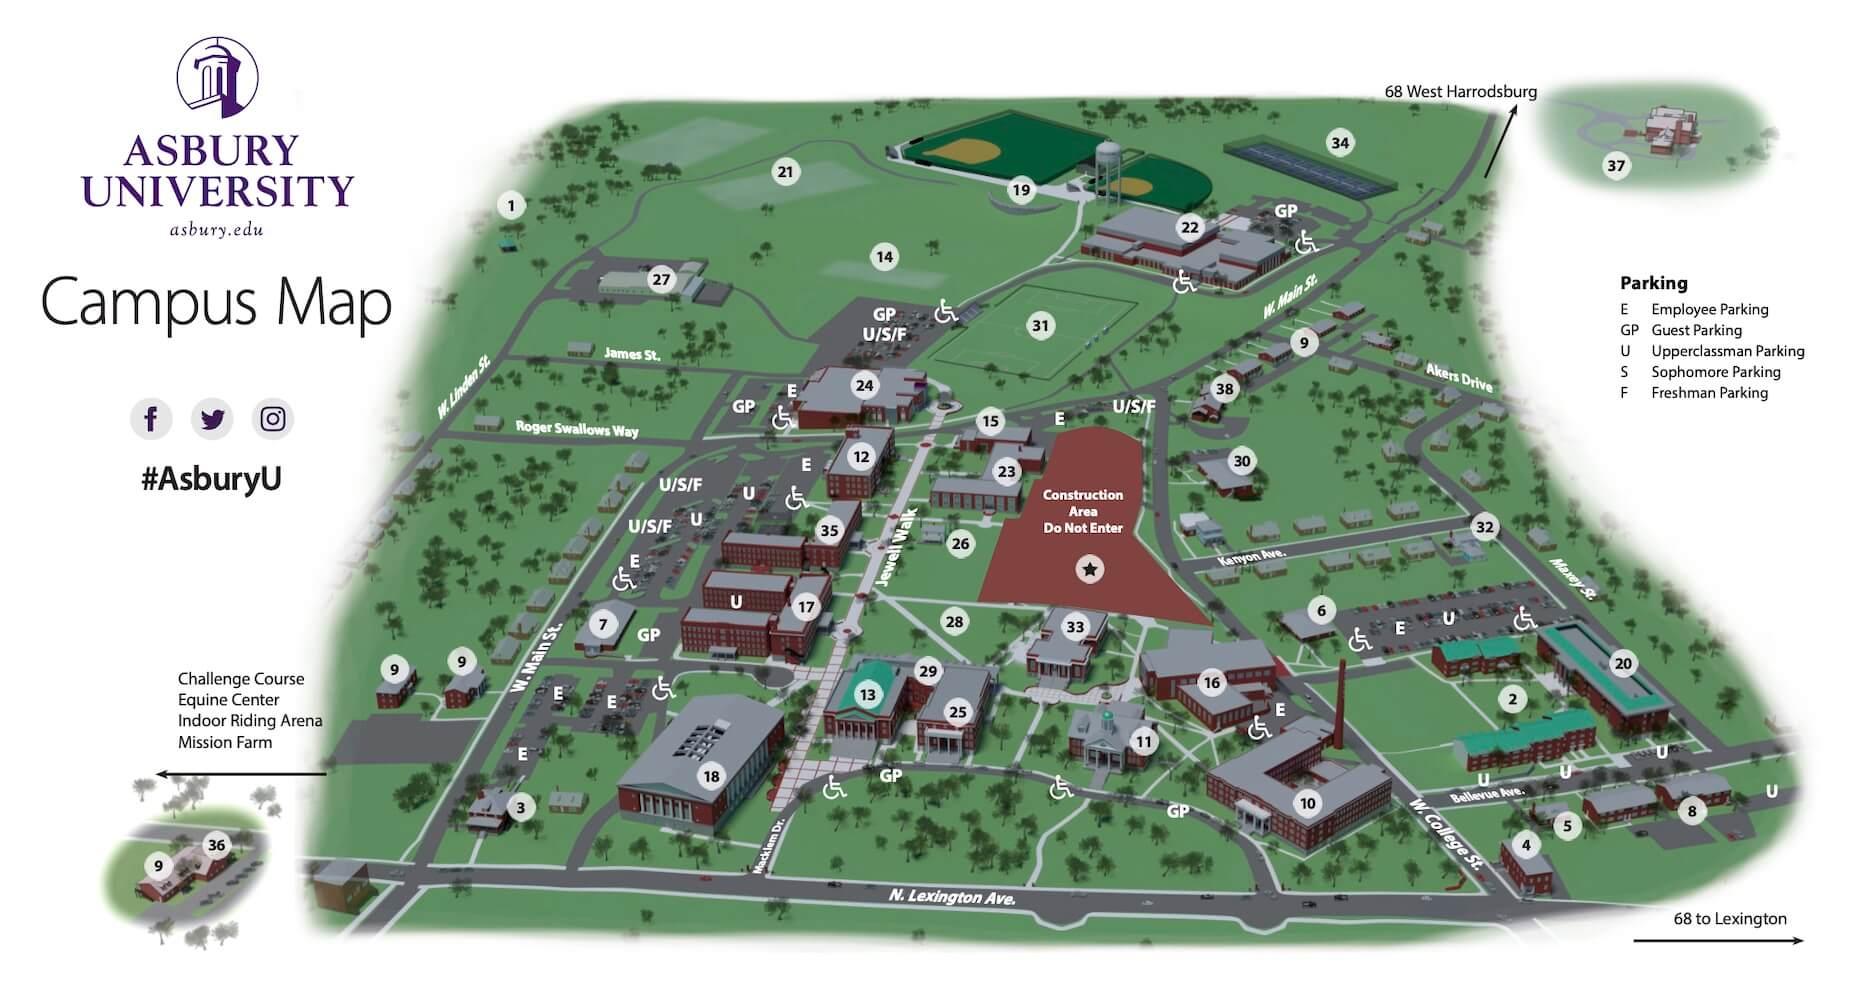 Asbury University Campus Map